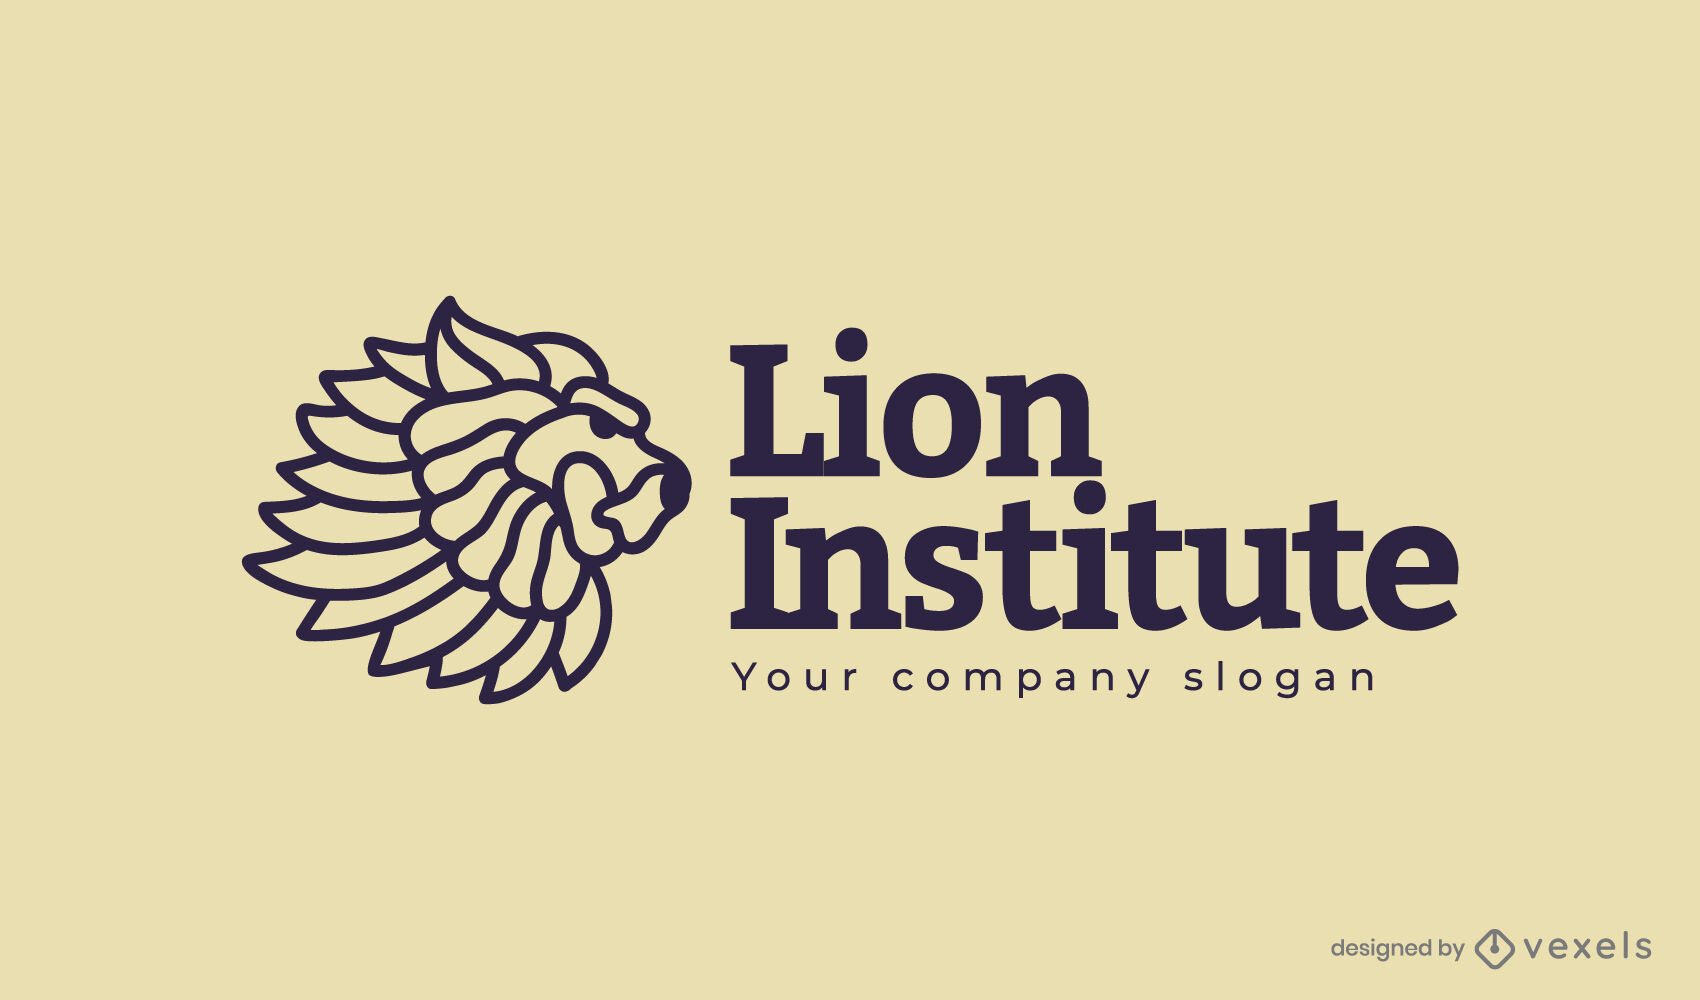 Design des Tierlogos des Lion Institute